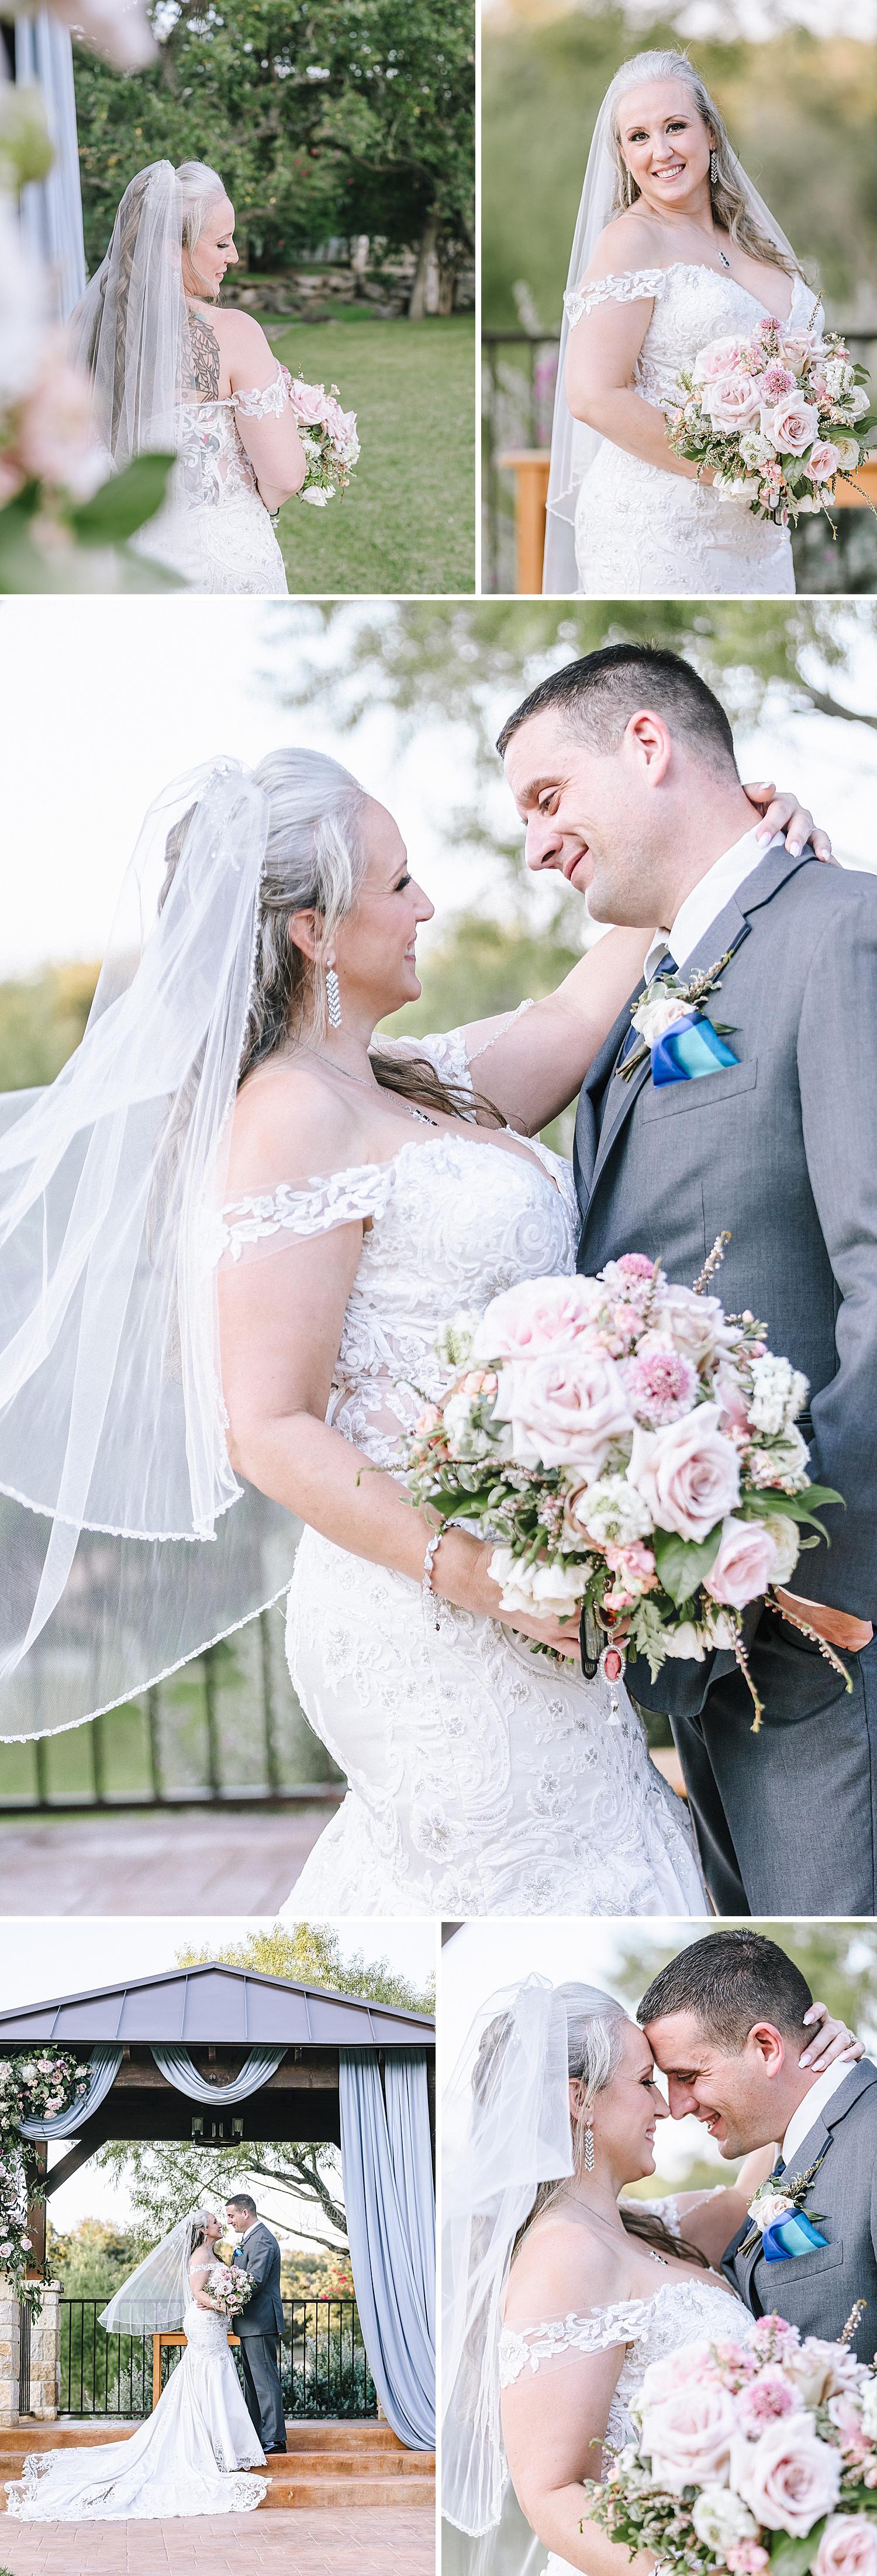 The-Club-at-Garden-Ridge-Military-Wedding-Carly-Barton-Photography_0049.jpg